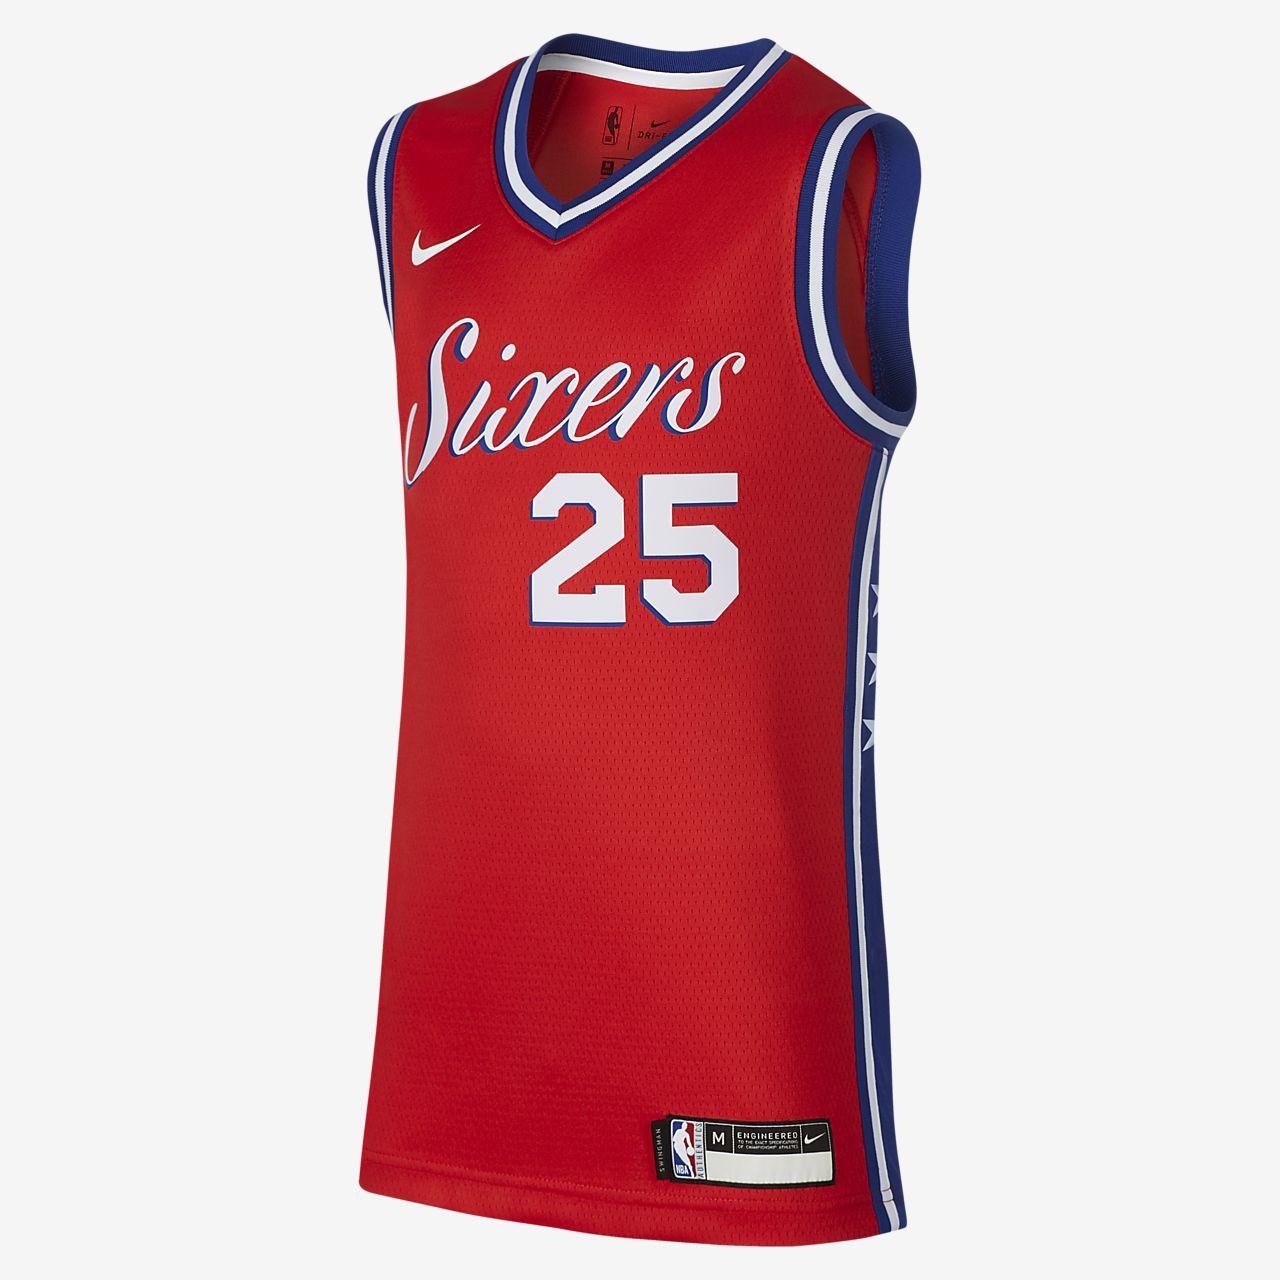 5b9ae63c37d ... 费城76 人队Statement Edition Swingman Nike NBA Jersey 大童(男孩)球衣